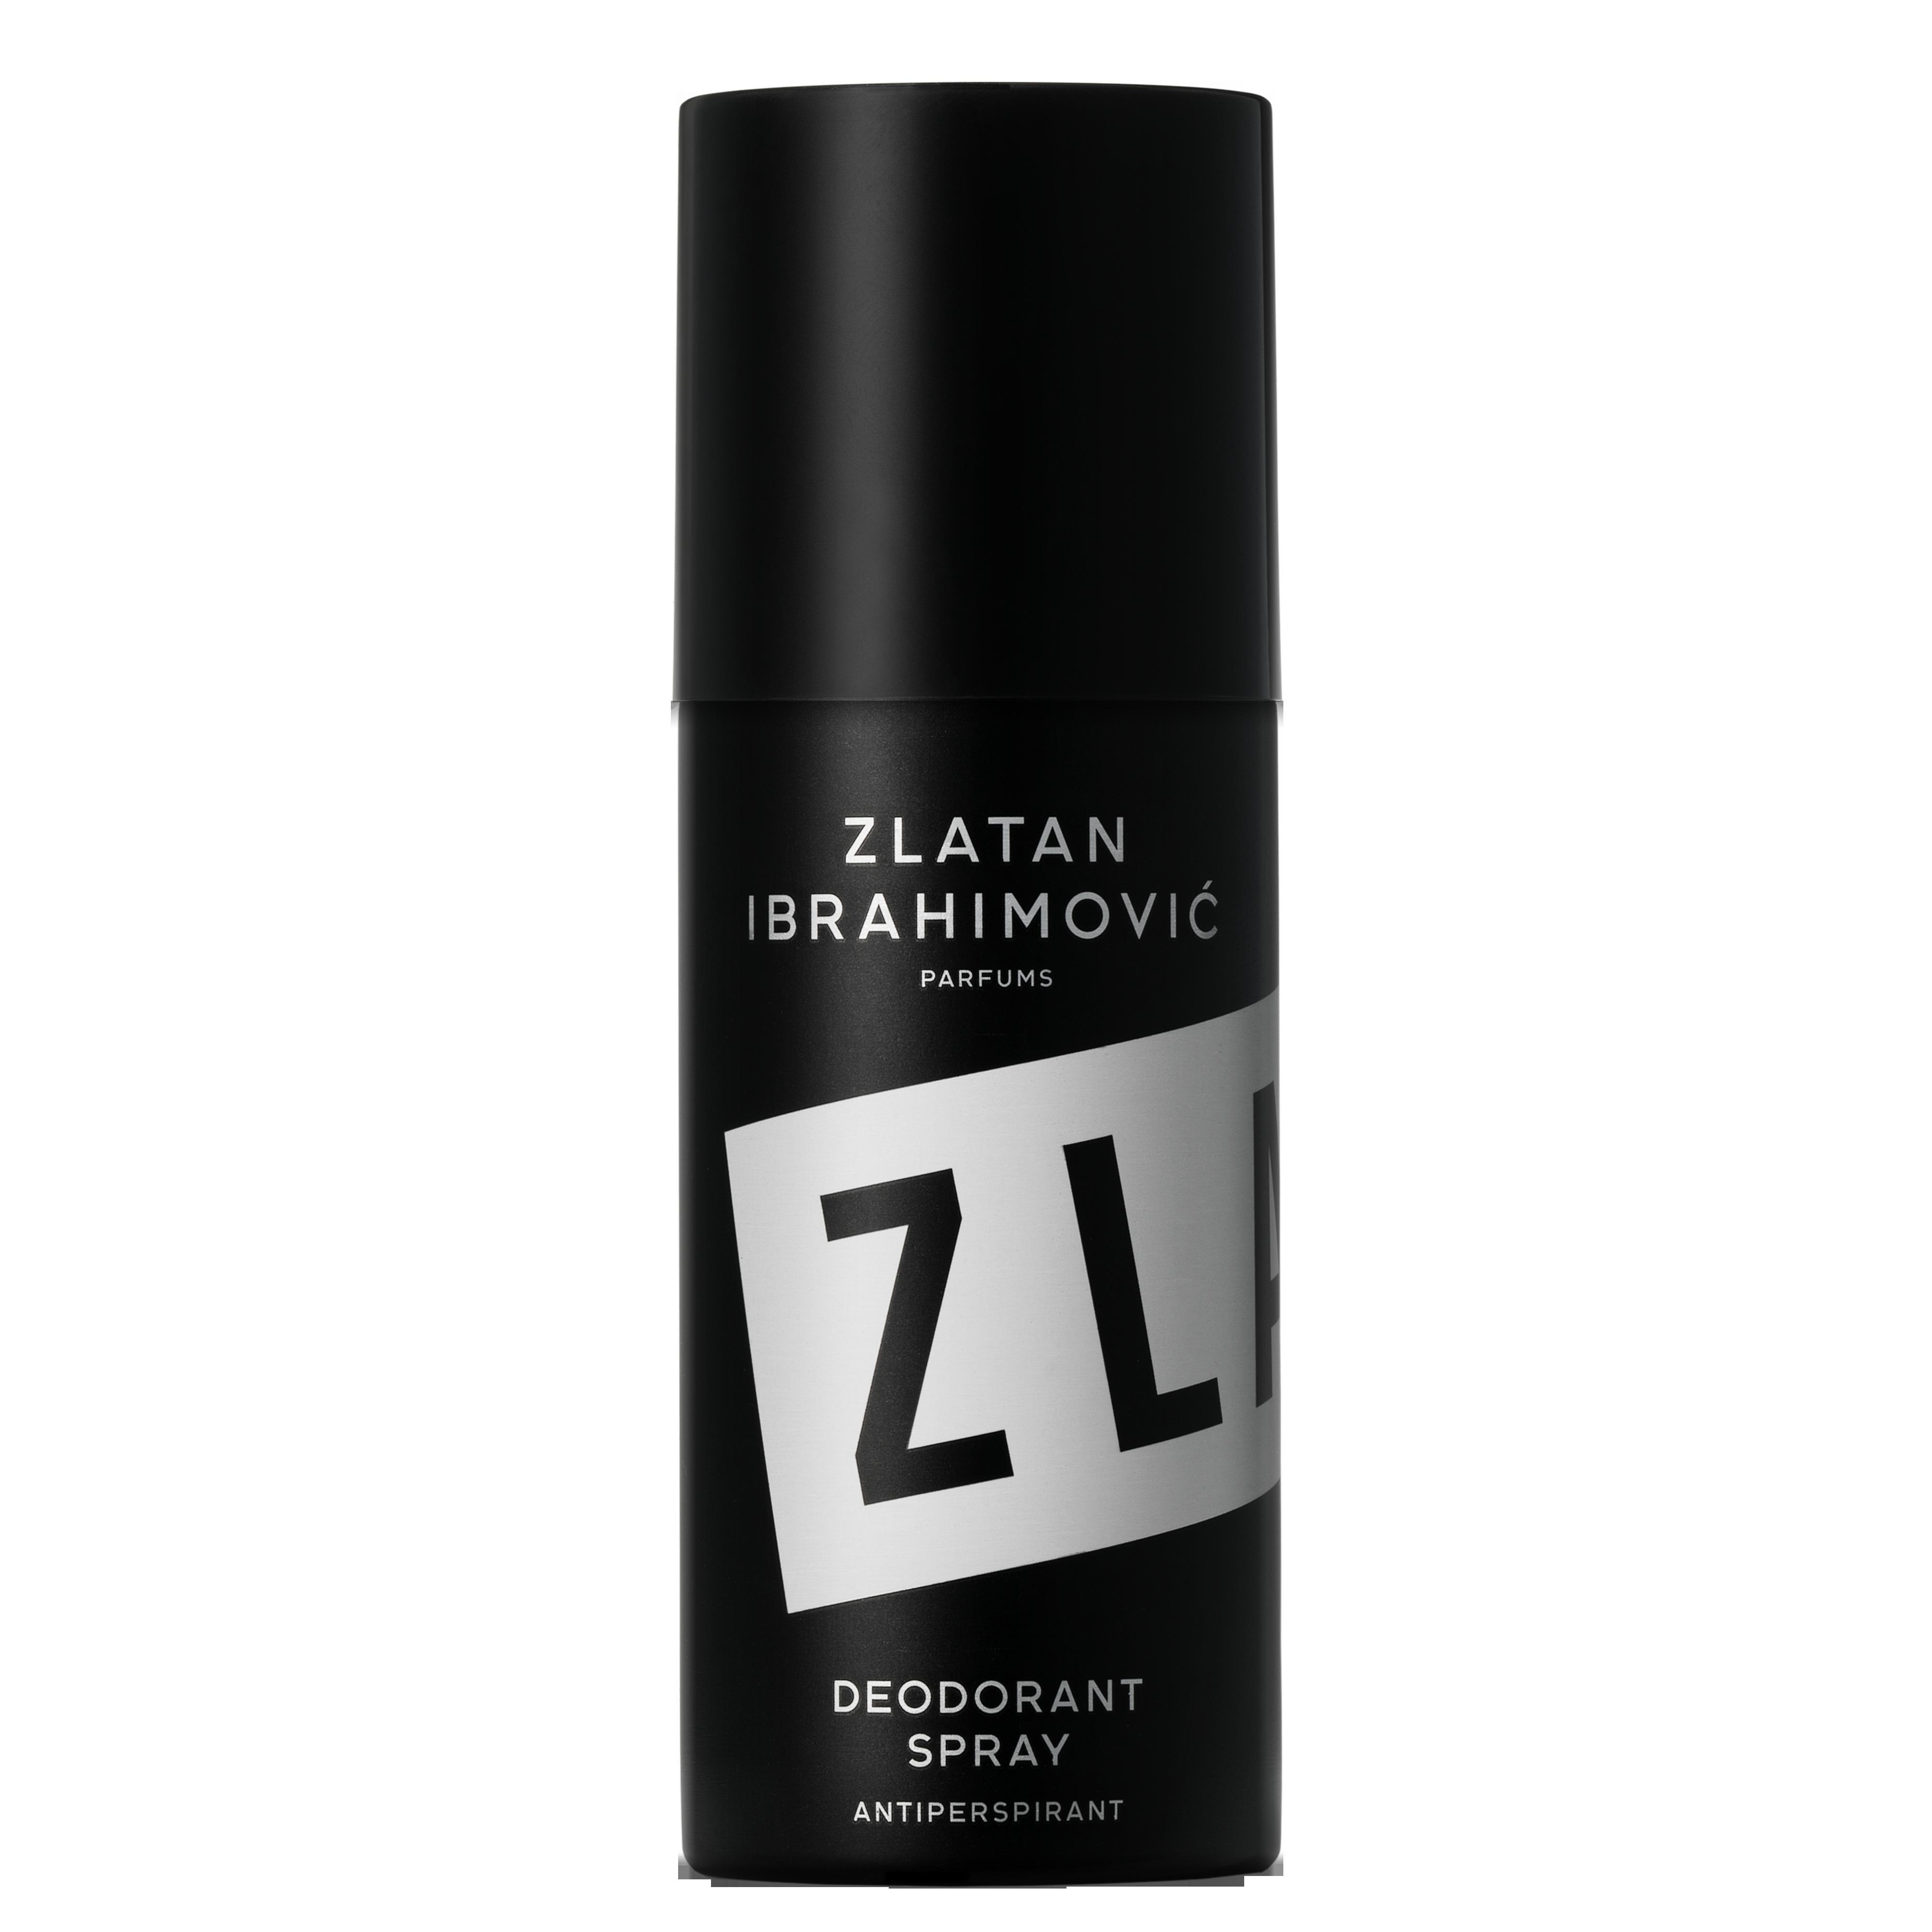 ZLATAN Deodorant Spray